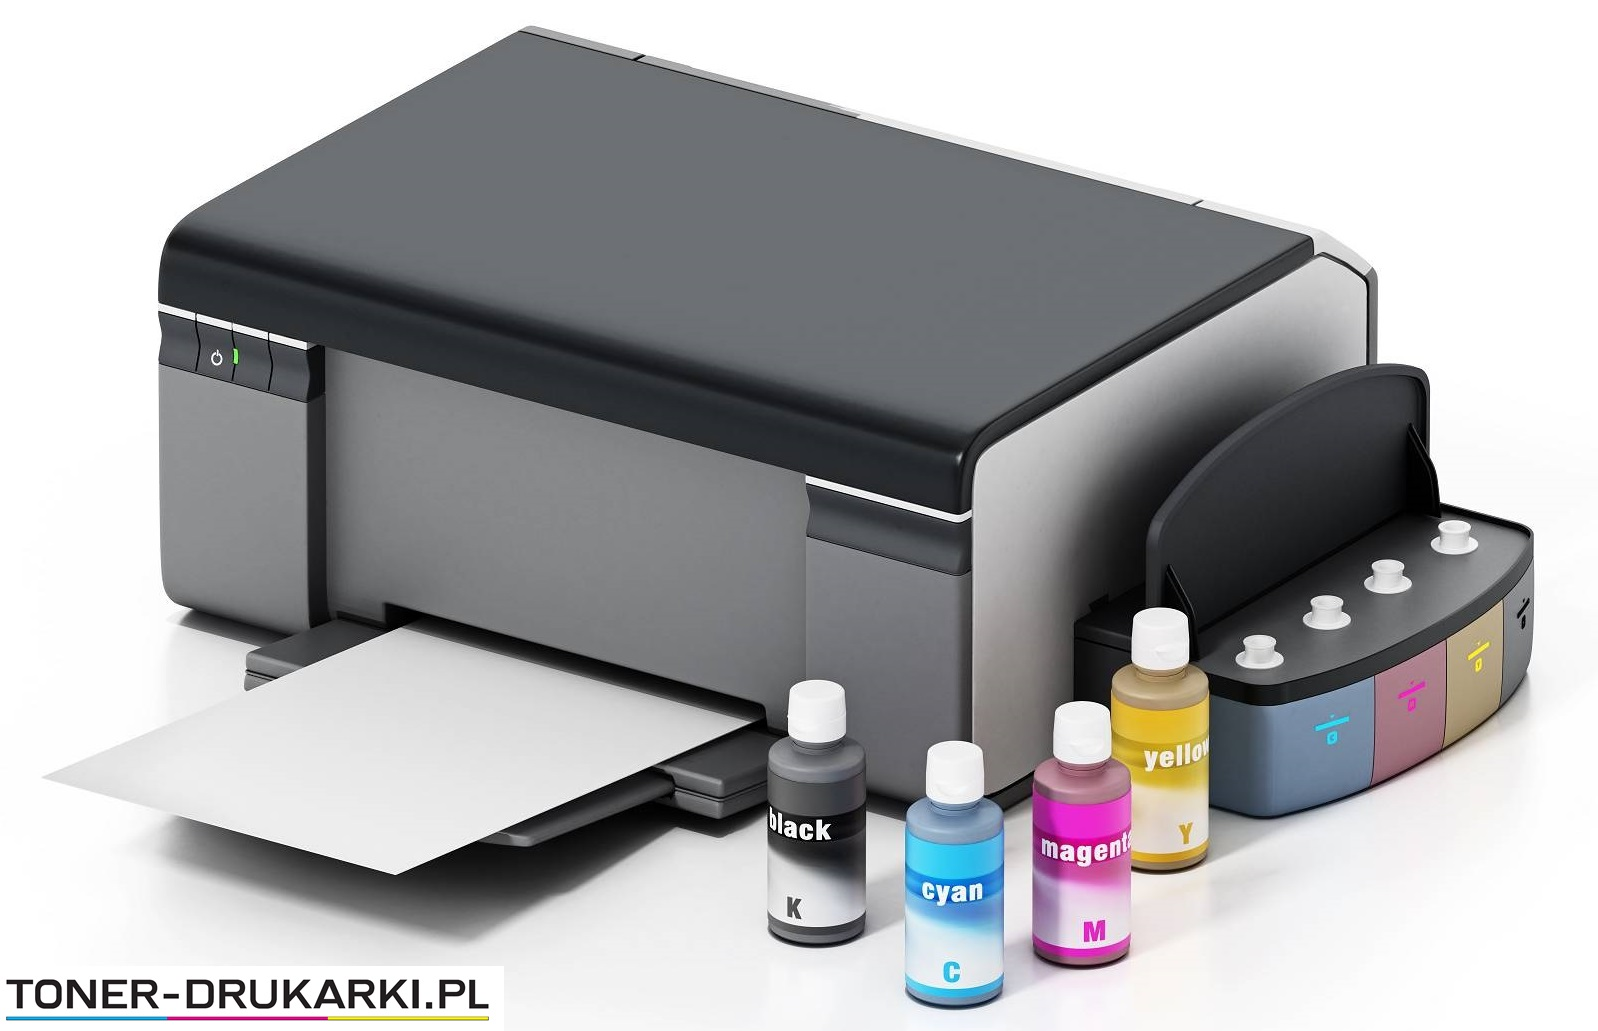 Ekologiczne drukarki